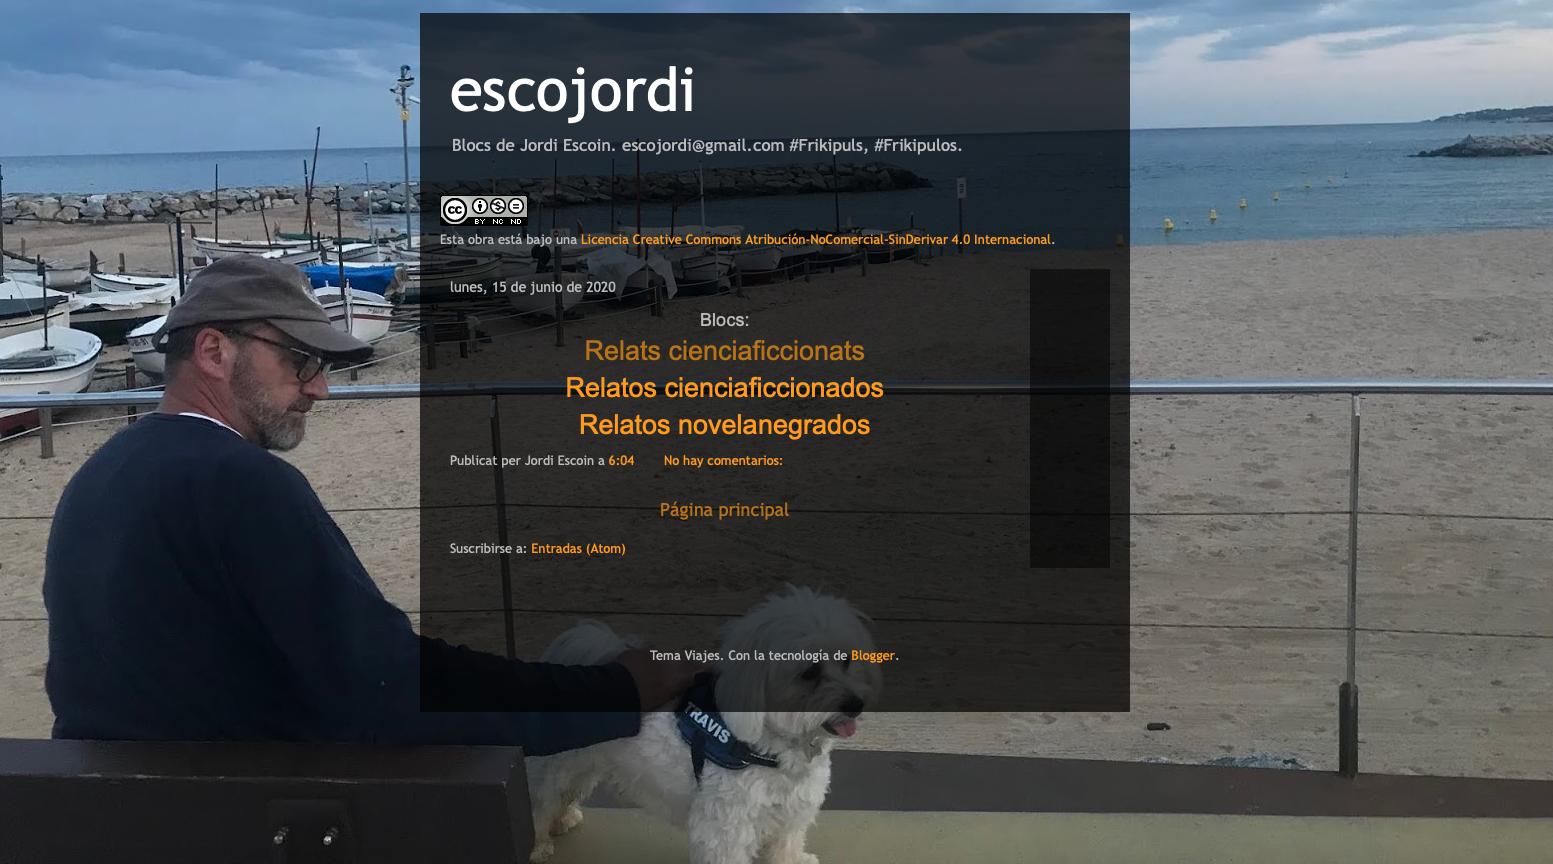 Escojordi, de Jordi Escoin